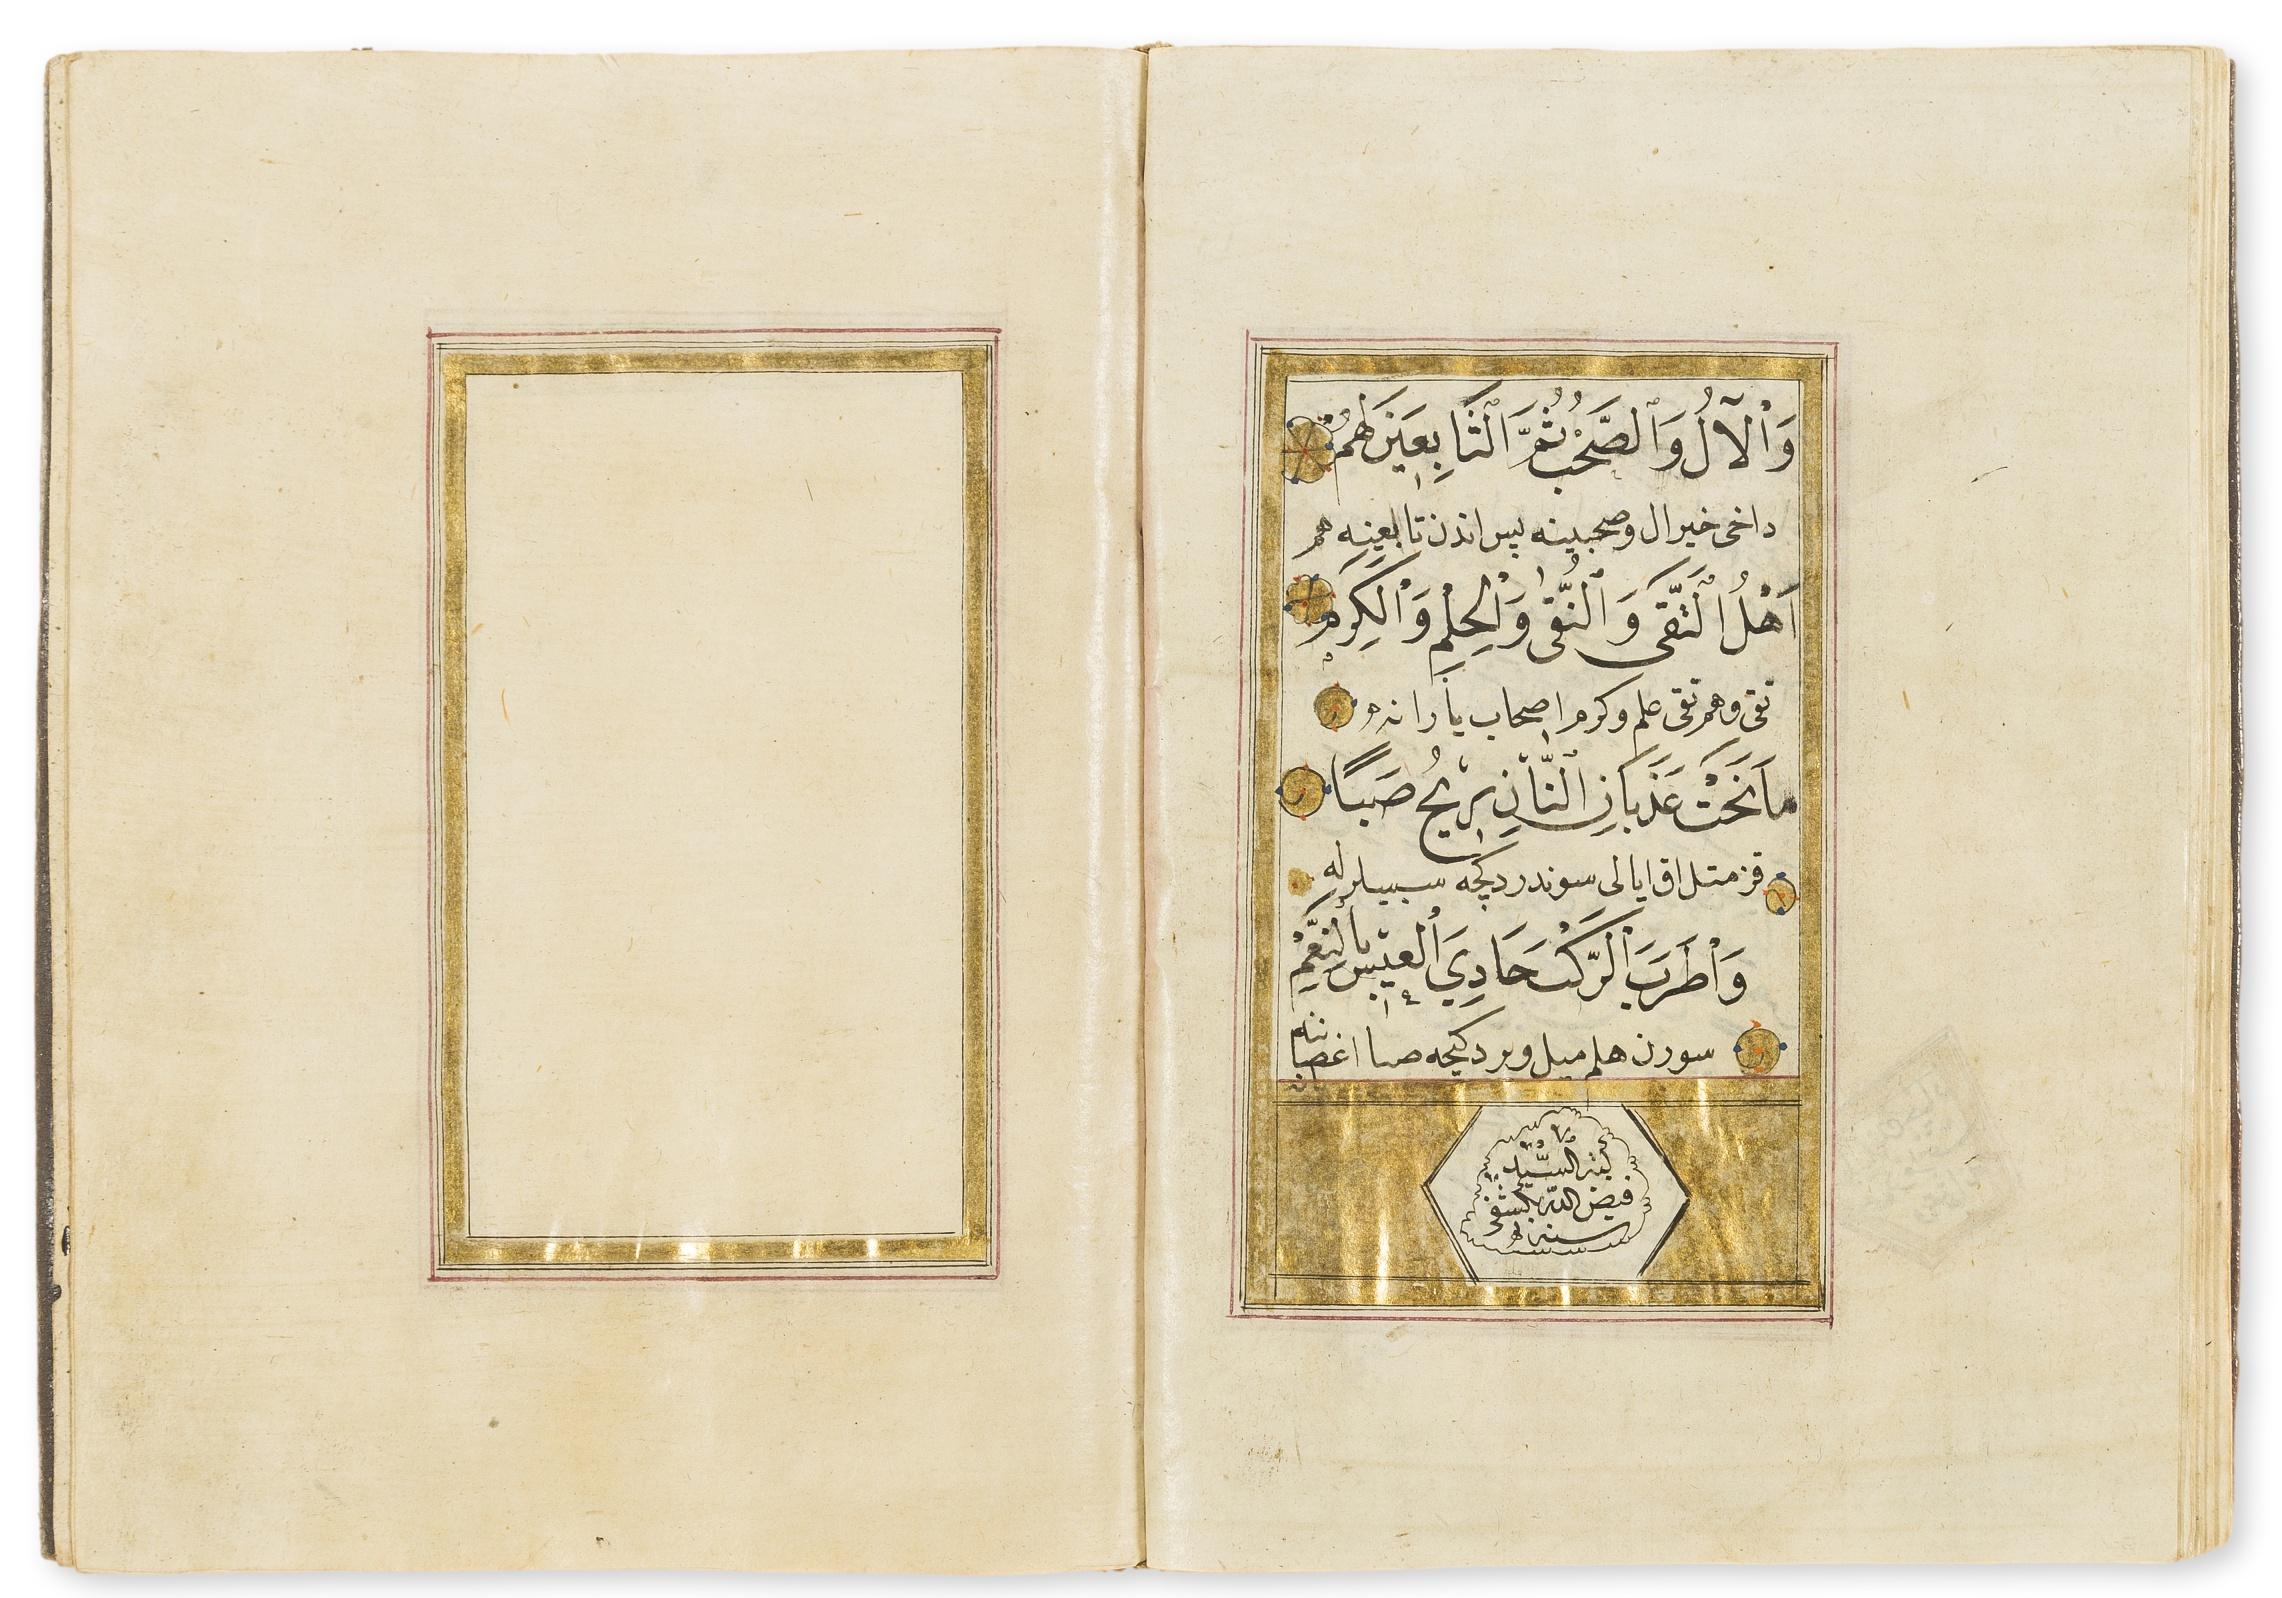 Middle Eastern ms.- Sharaf al-Din Abu 'Abdallah Muhammad bin Sa'id al-Dalasi al-Busiri al-Sanhaji … - Image 3 of 3